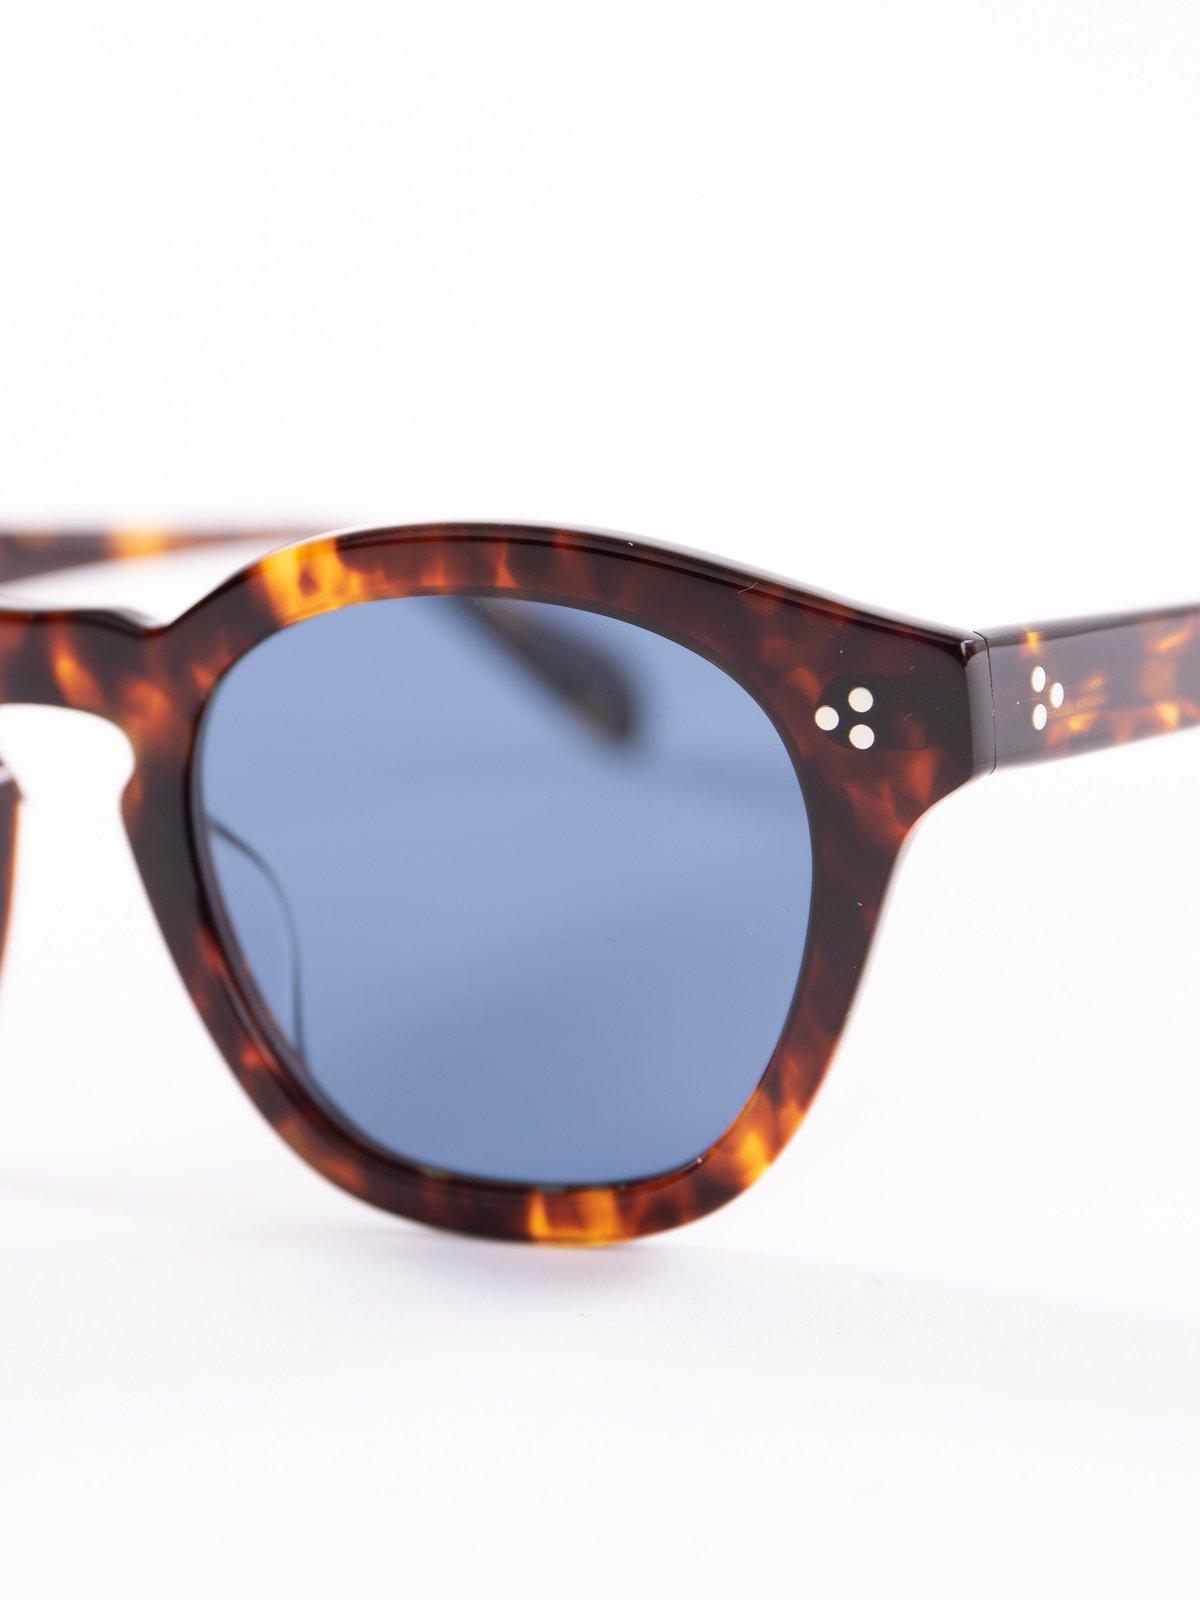 DM2/Dark Blue Boudreau LA Sunglasses - Image 3